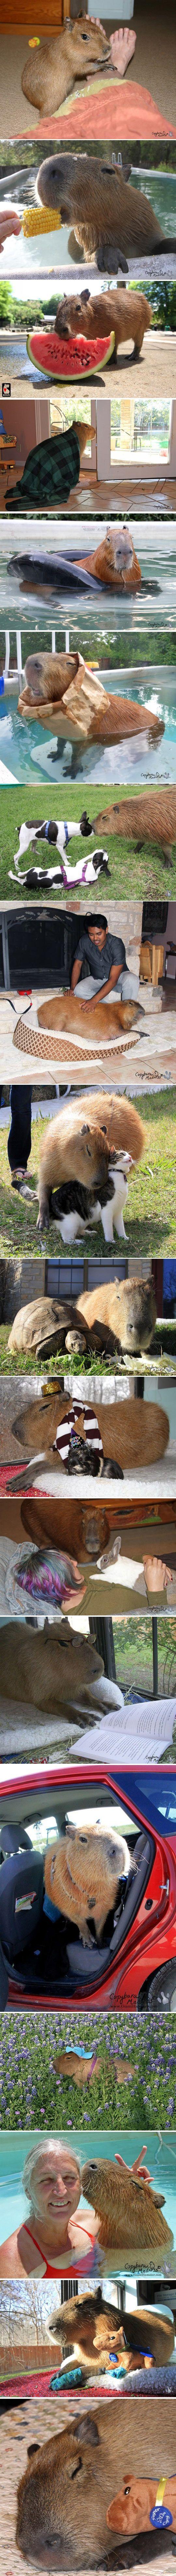 The Internet needs more capybaras…: